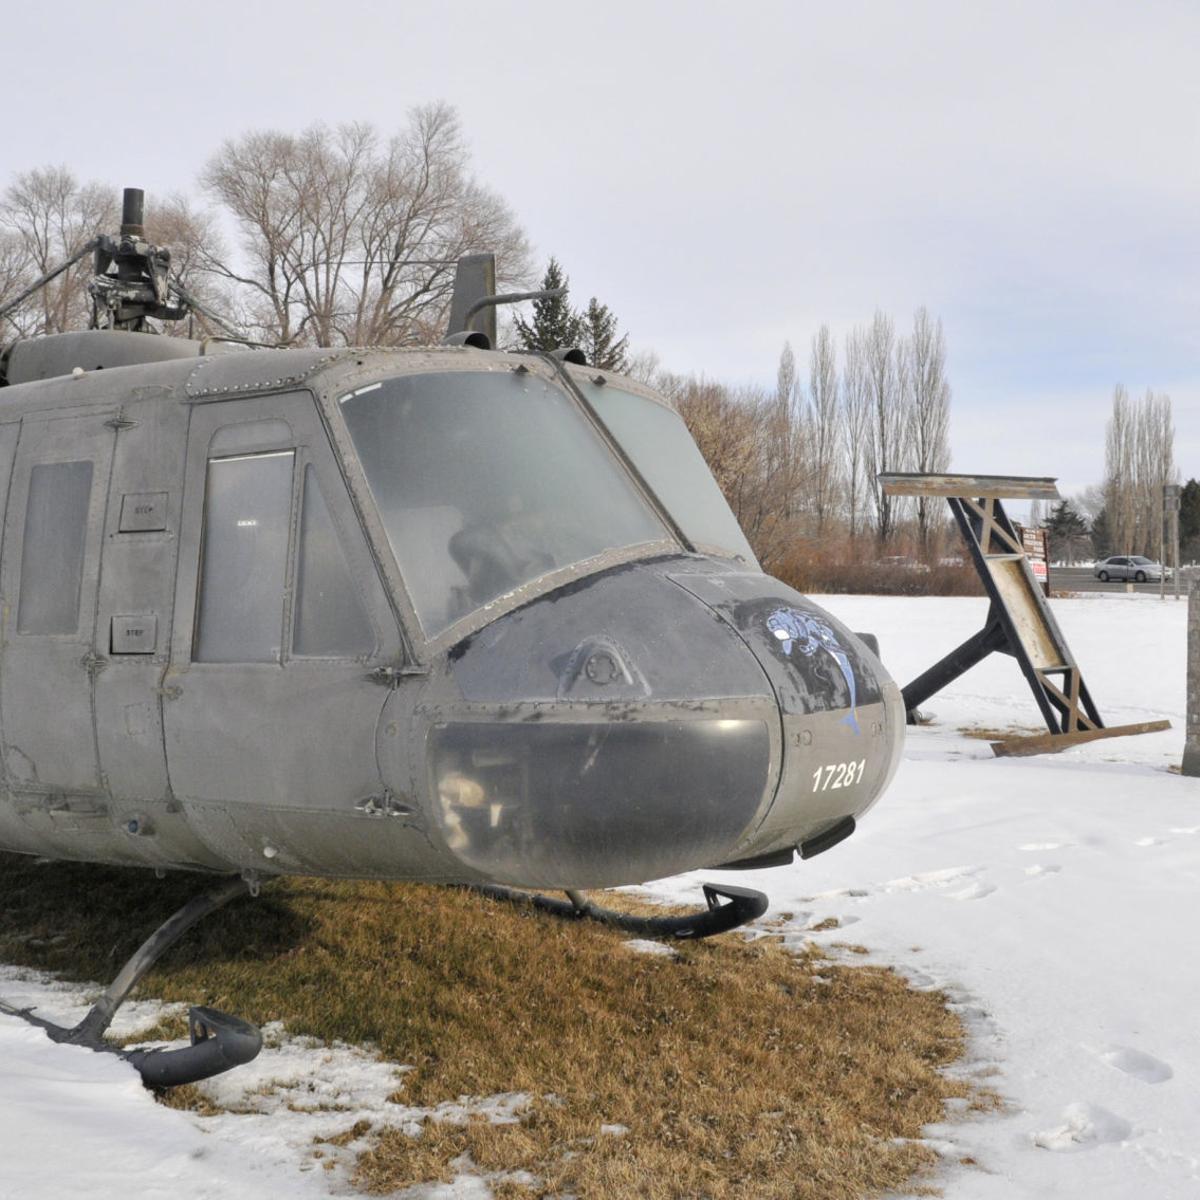 Veterans work to raise money to repair Burley Vietnam War